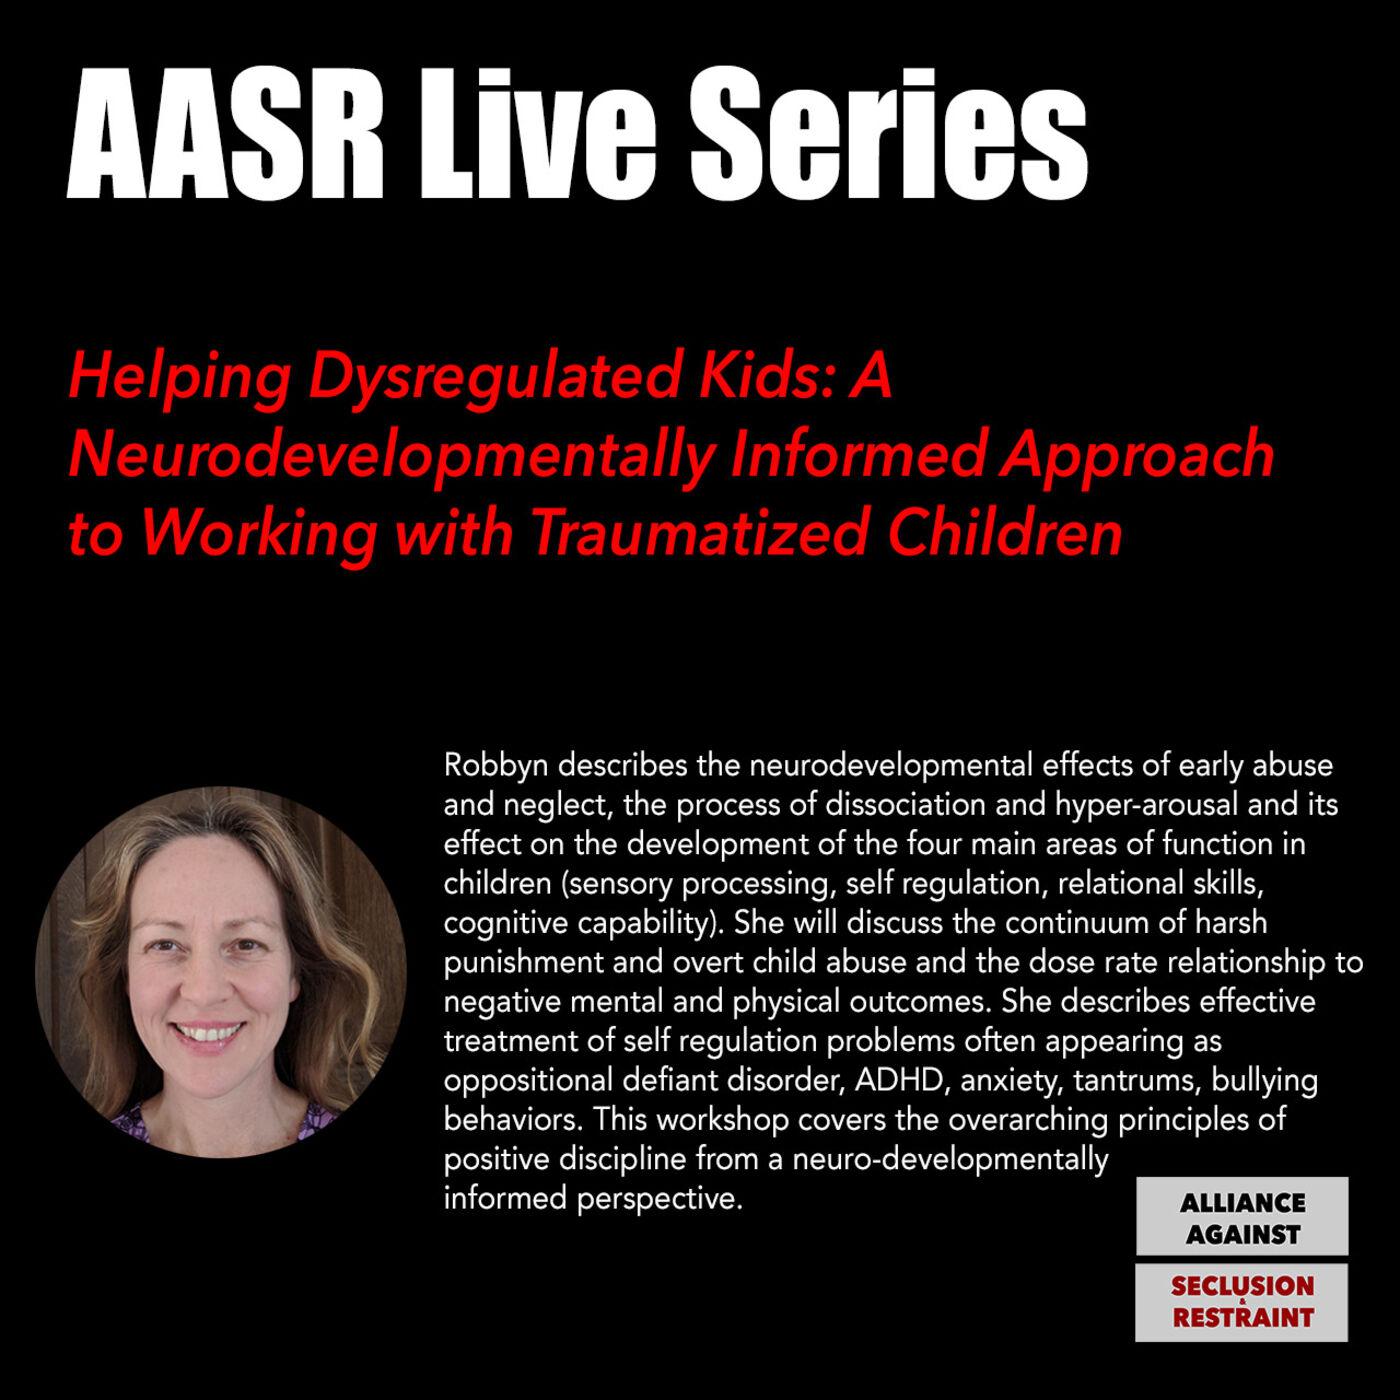 Helping Dysregulated Kids: Neurodevelopmentally Informed Approach to Working w/ Traumatized Children